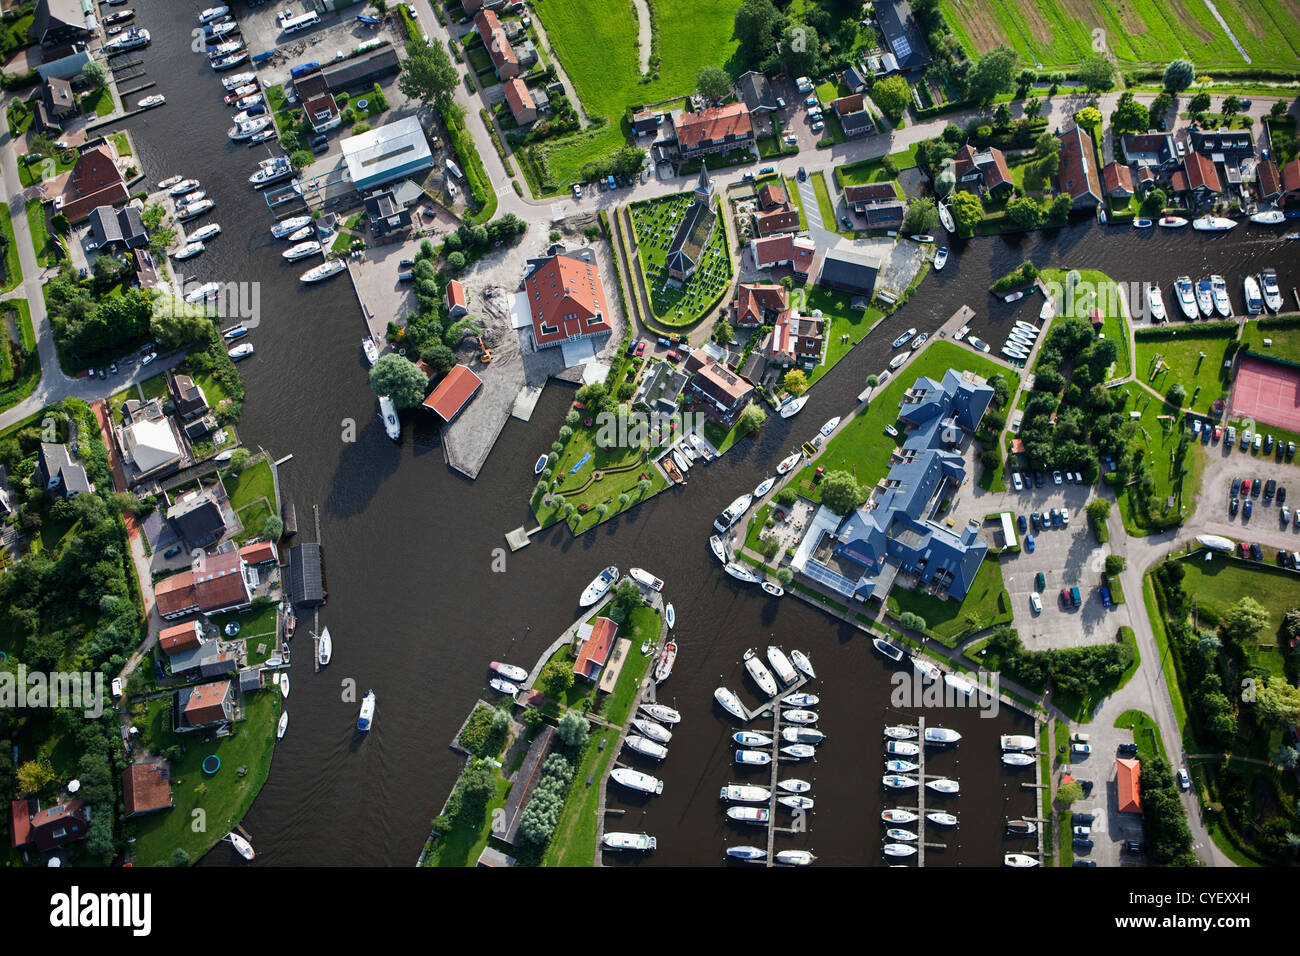 The Netherlands, Uitwellingerga, Aerial. Center of village and marina. - Stock Image